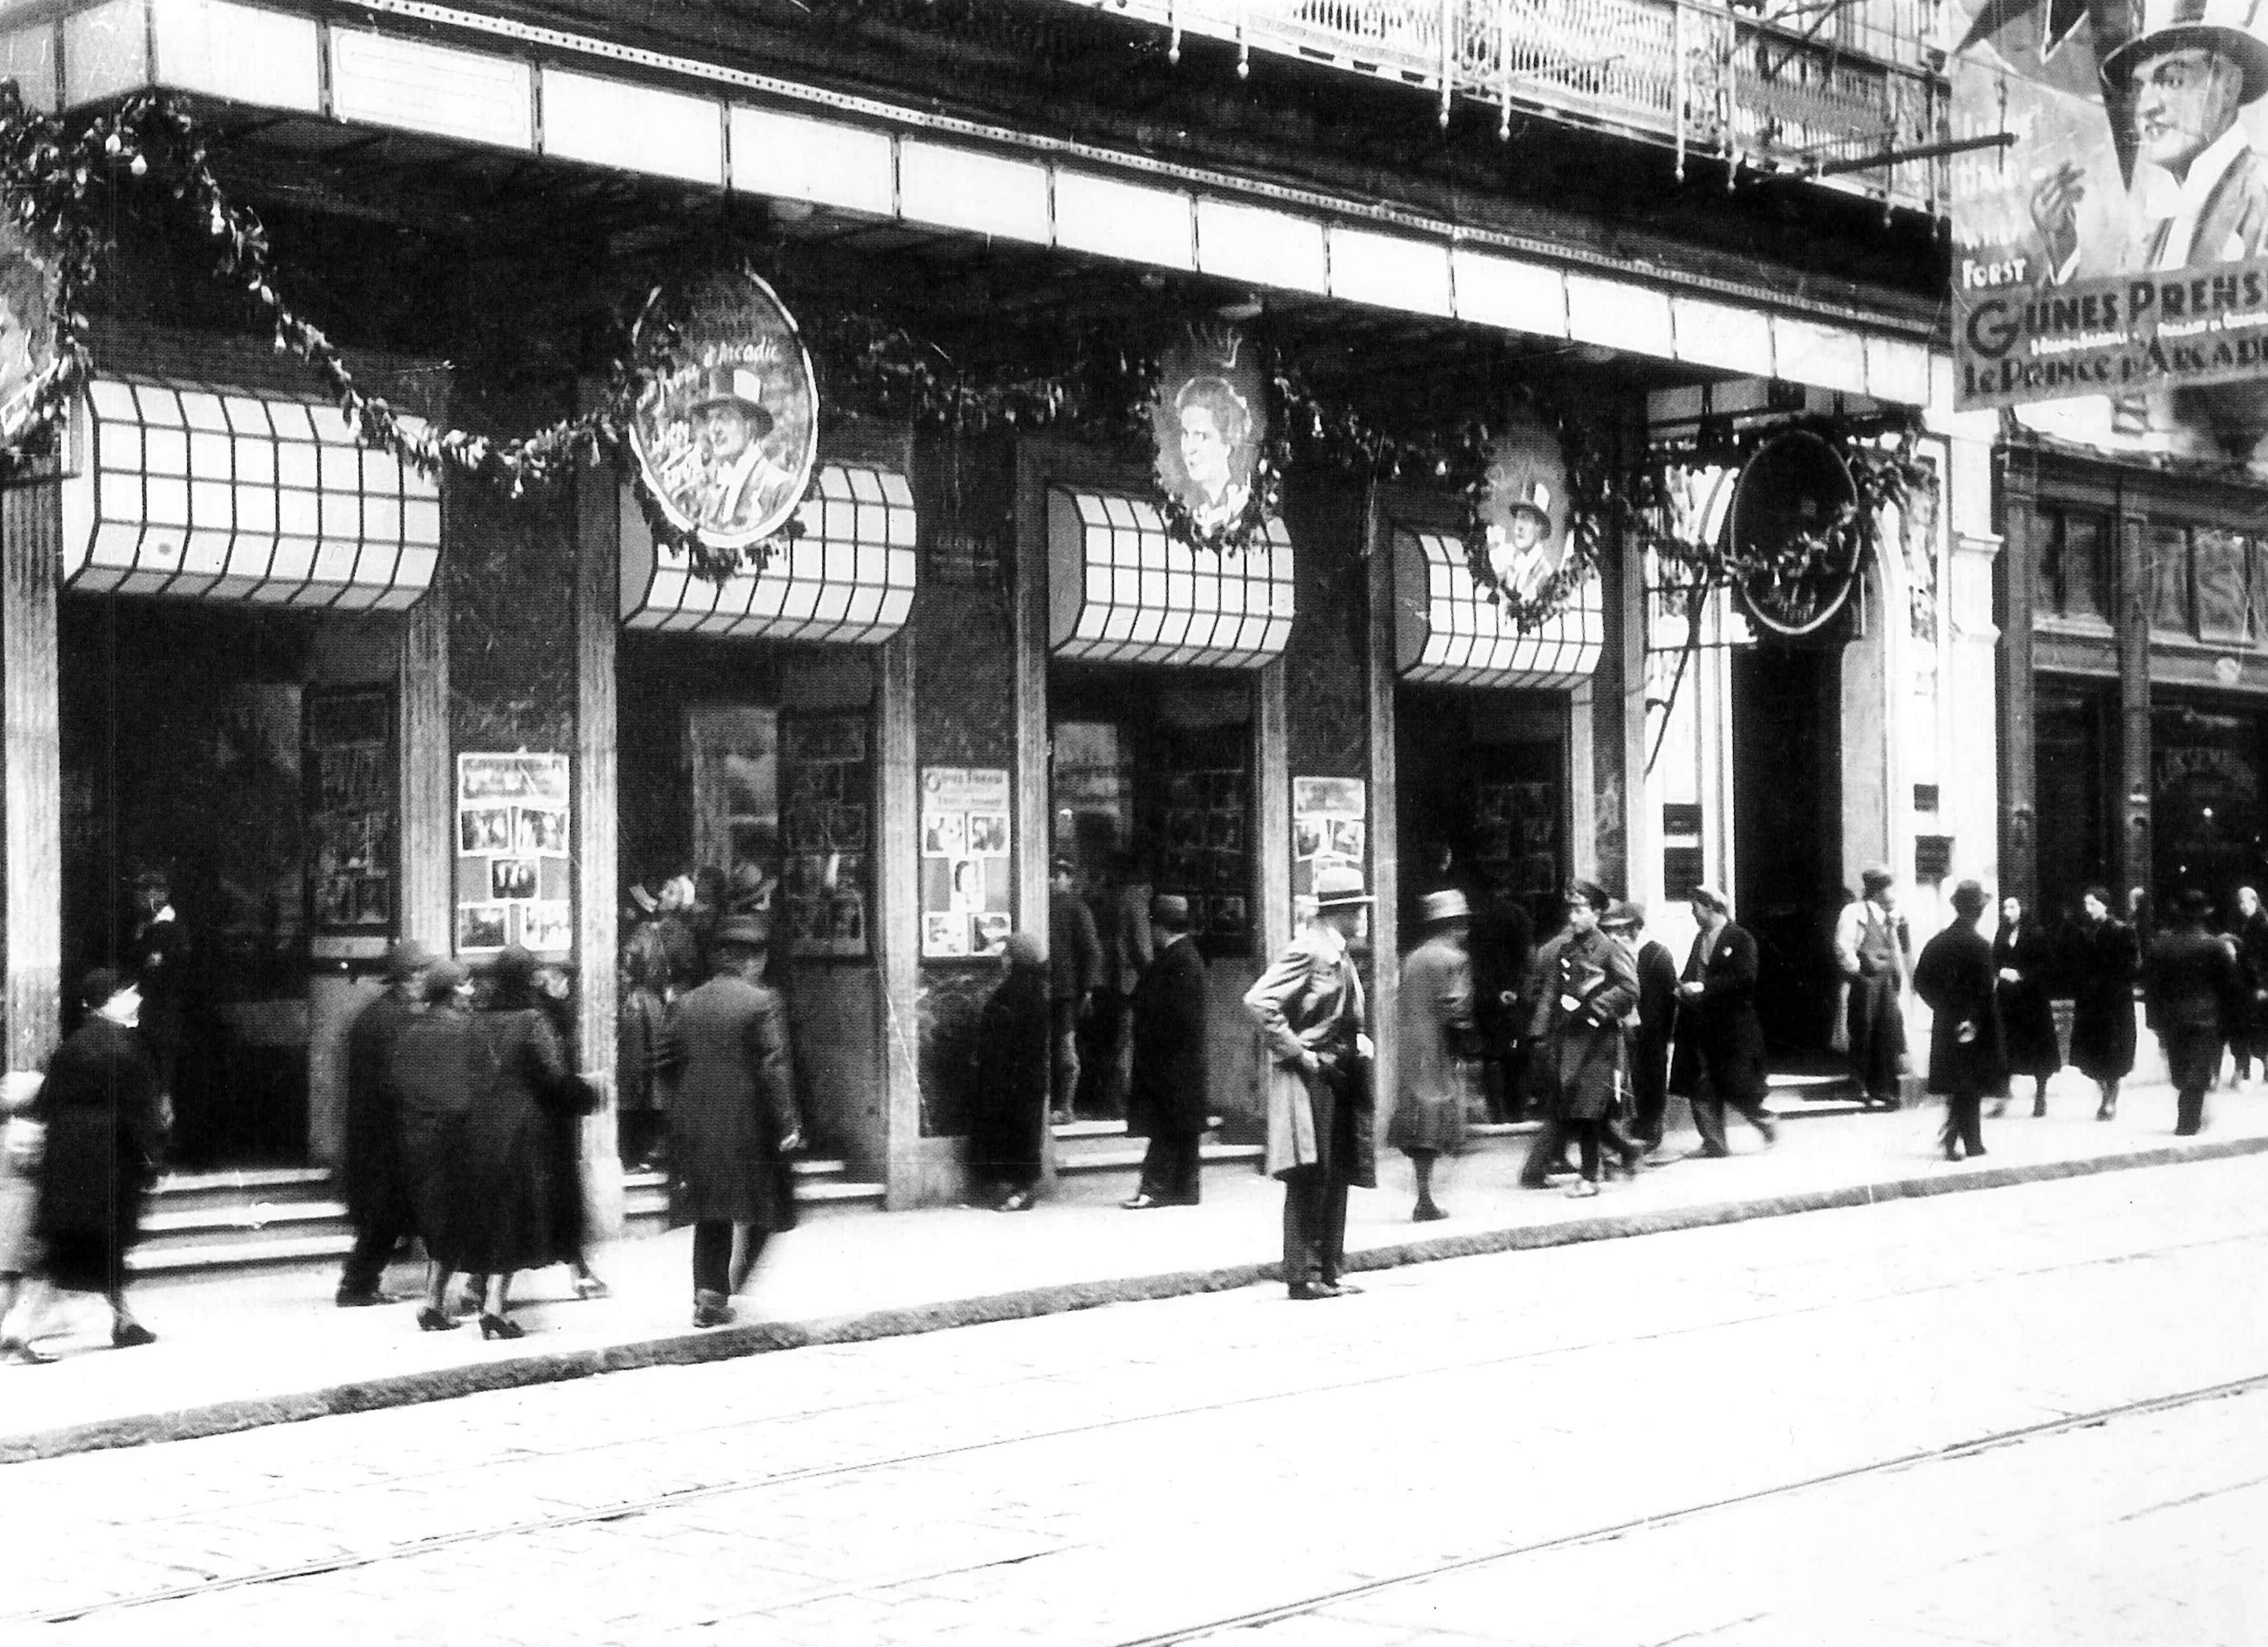 Historical Cinema to Shopping Centre